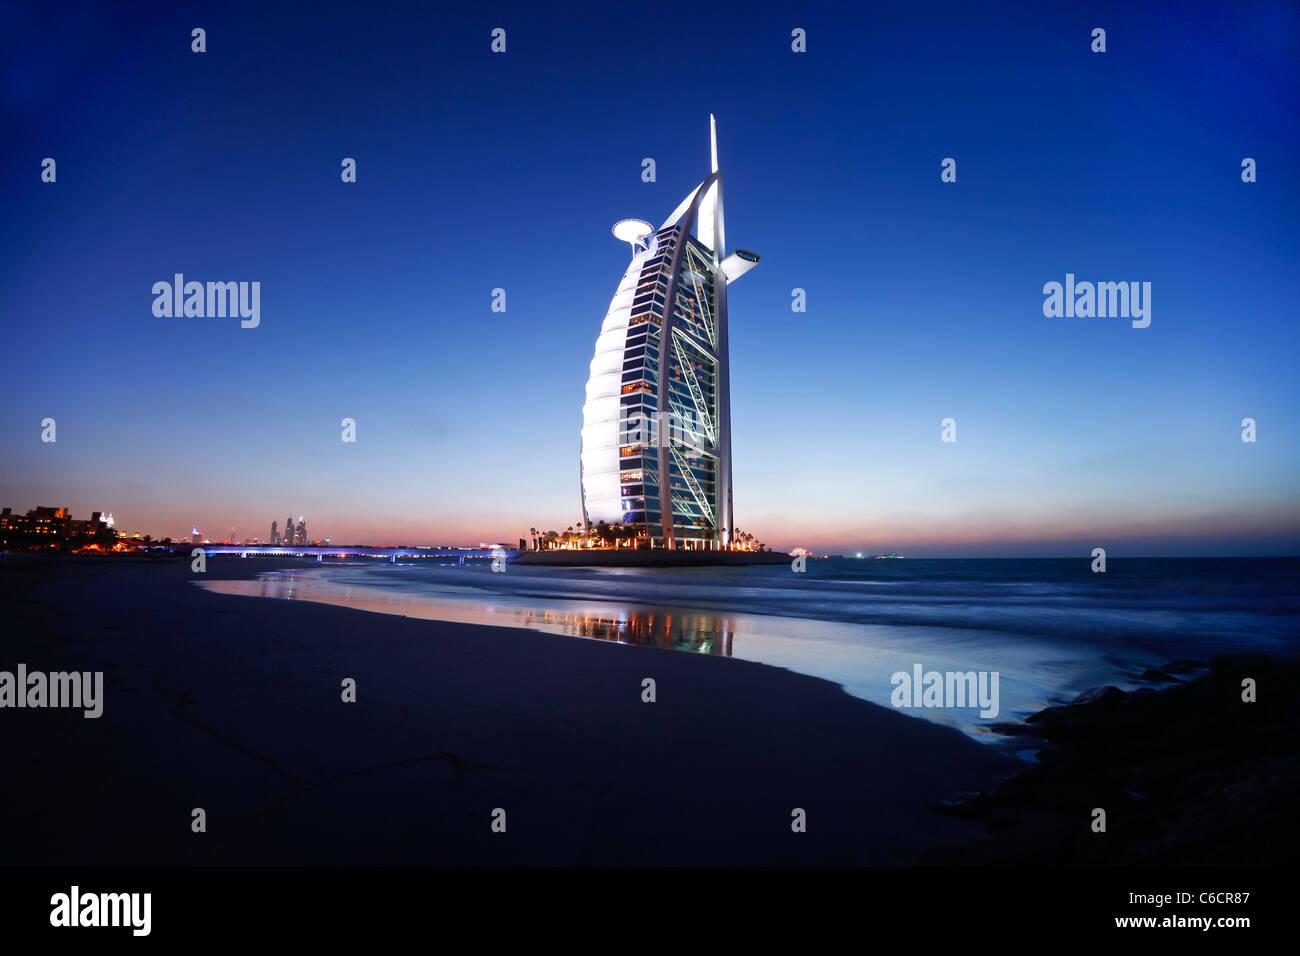 Burj Al Arab Hotel, Dubai, United Arab Emirates - Stock Image